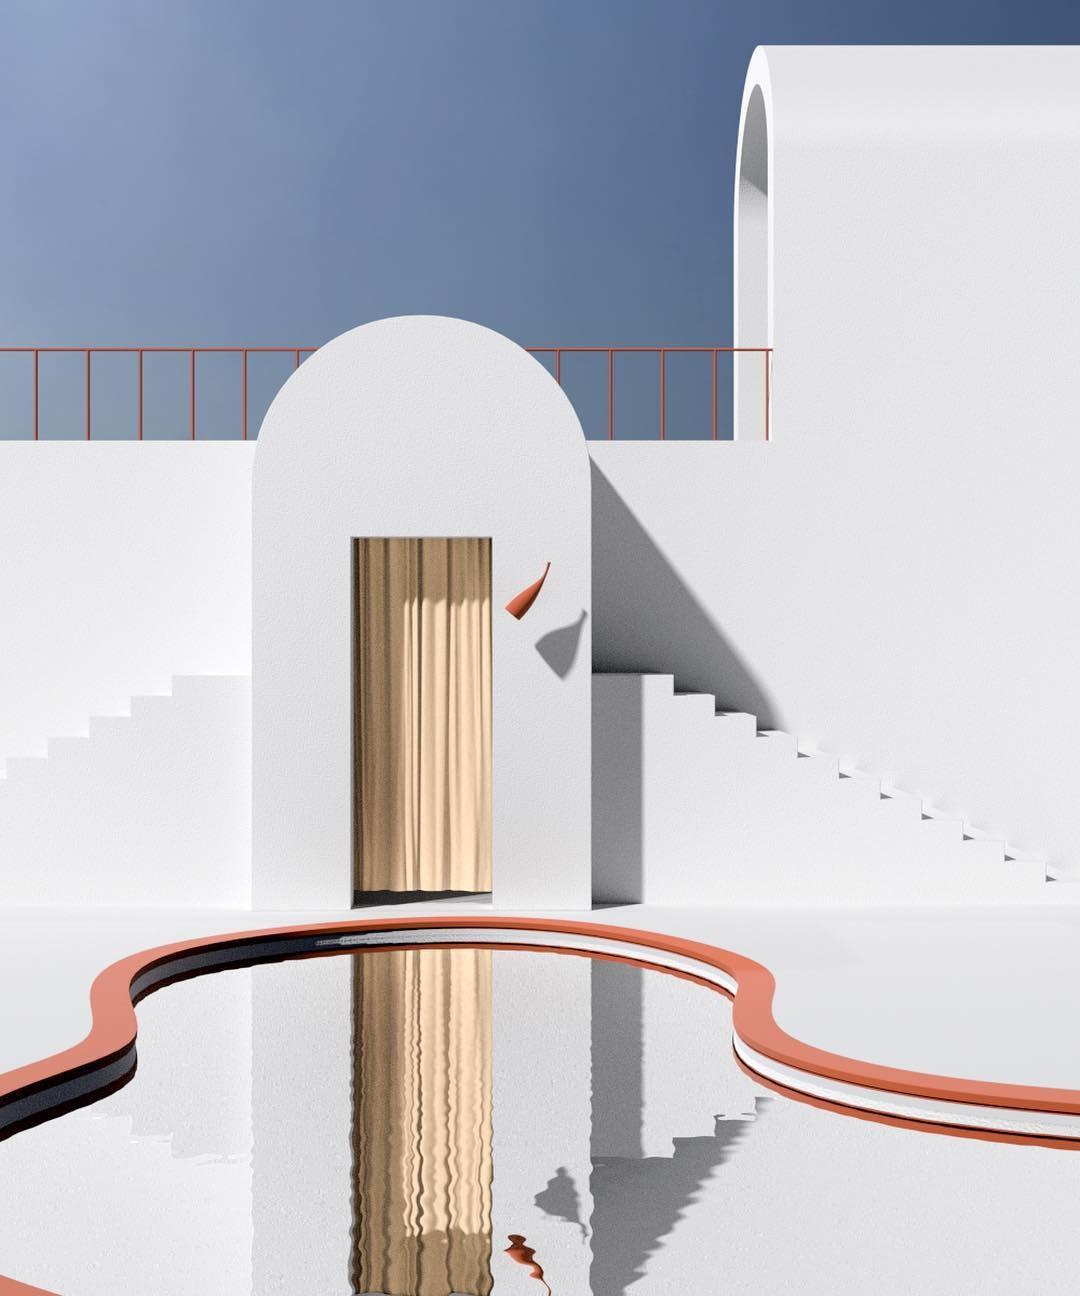 Инстаграм недели: архитектура мечты Алексиса Христодулу (галерея 10, фото 0)